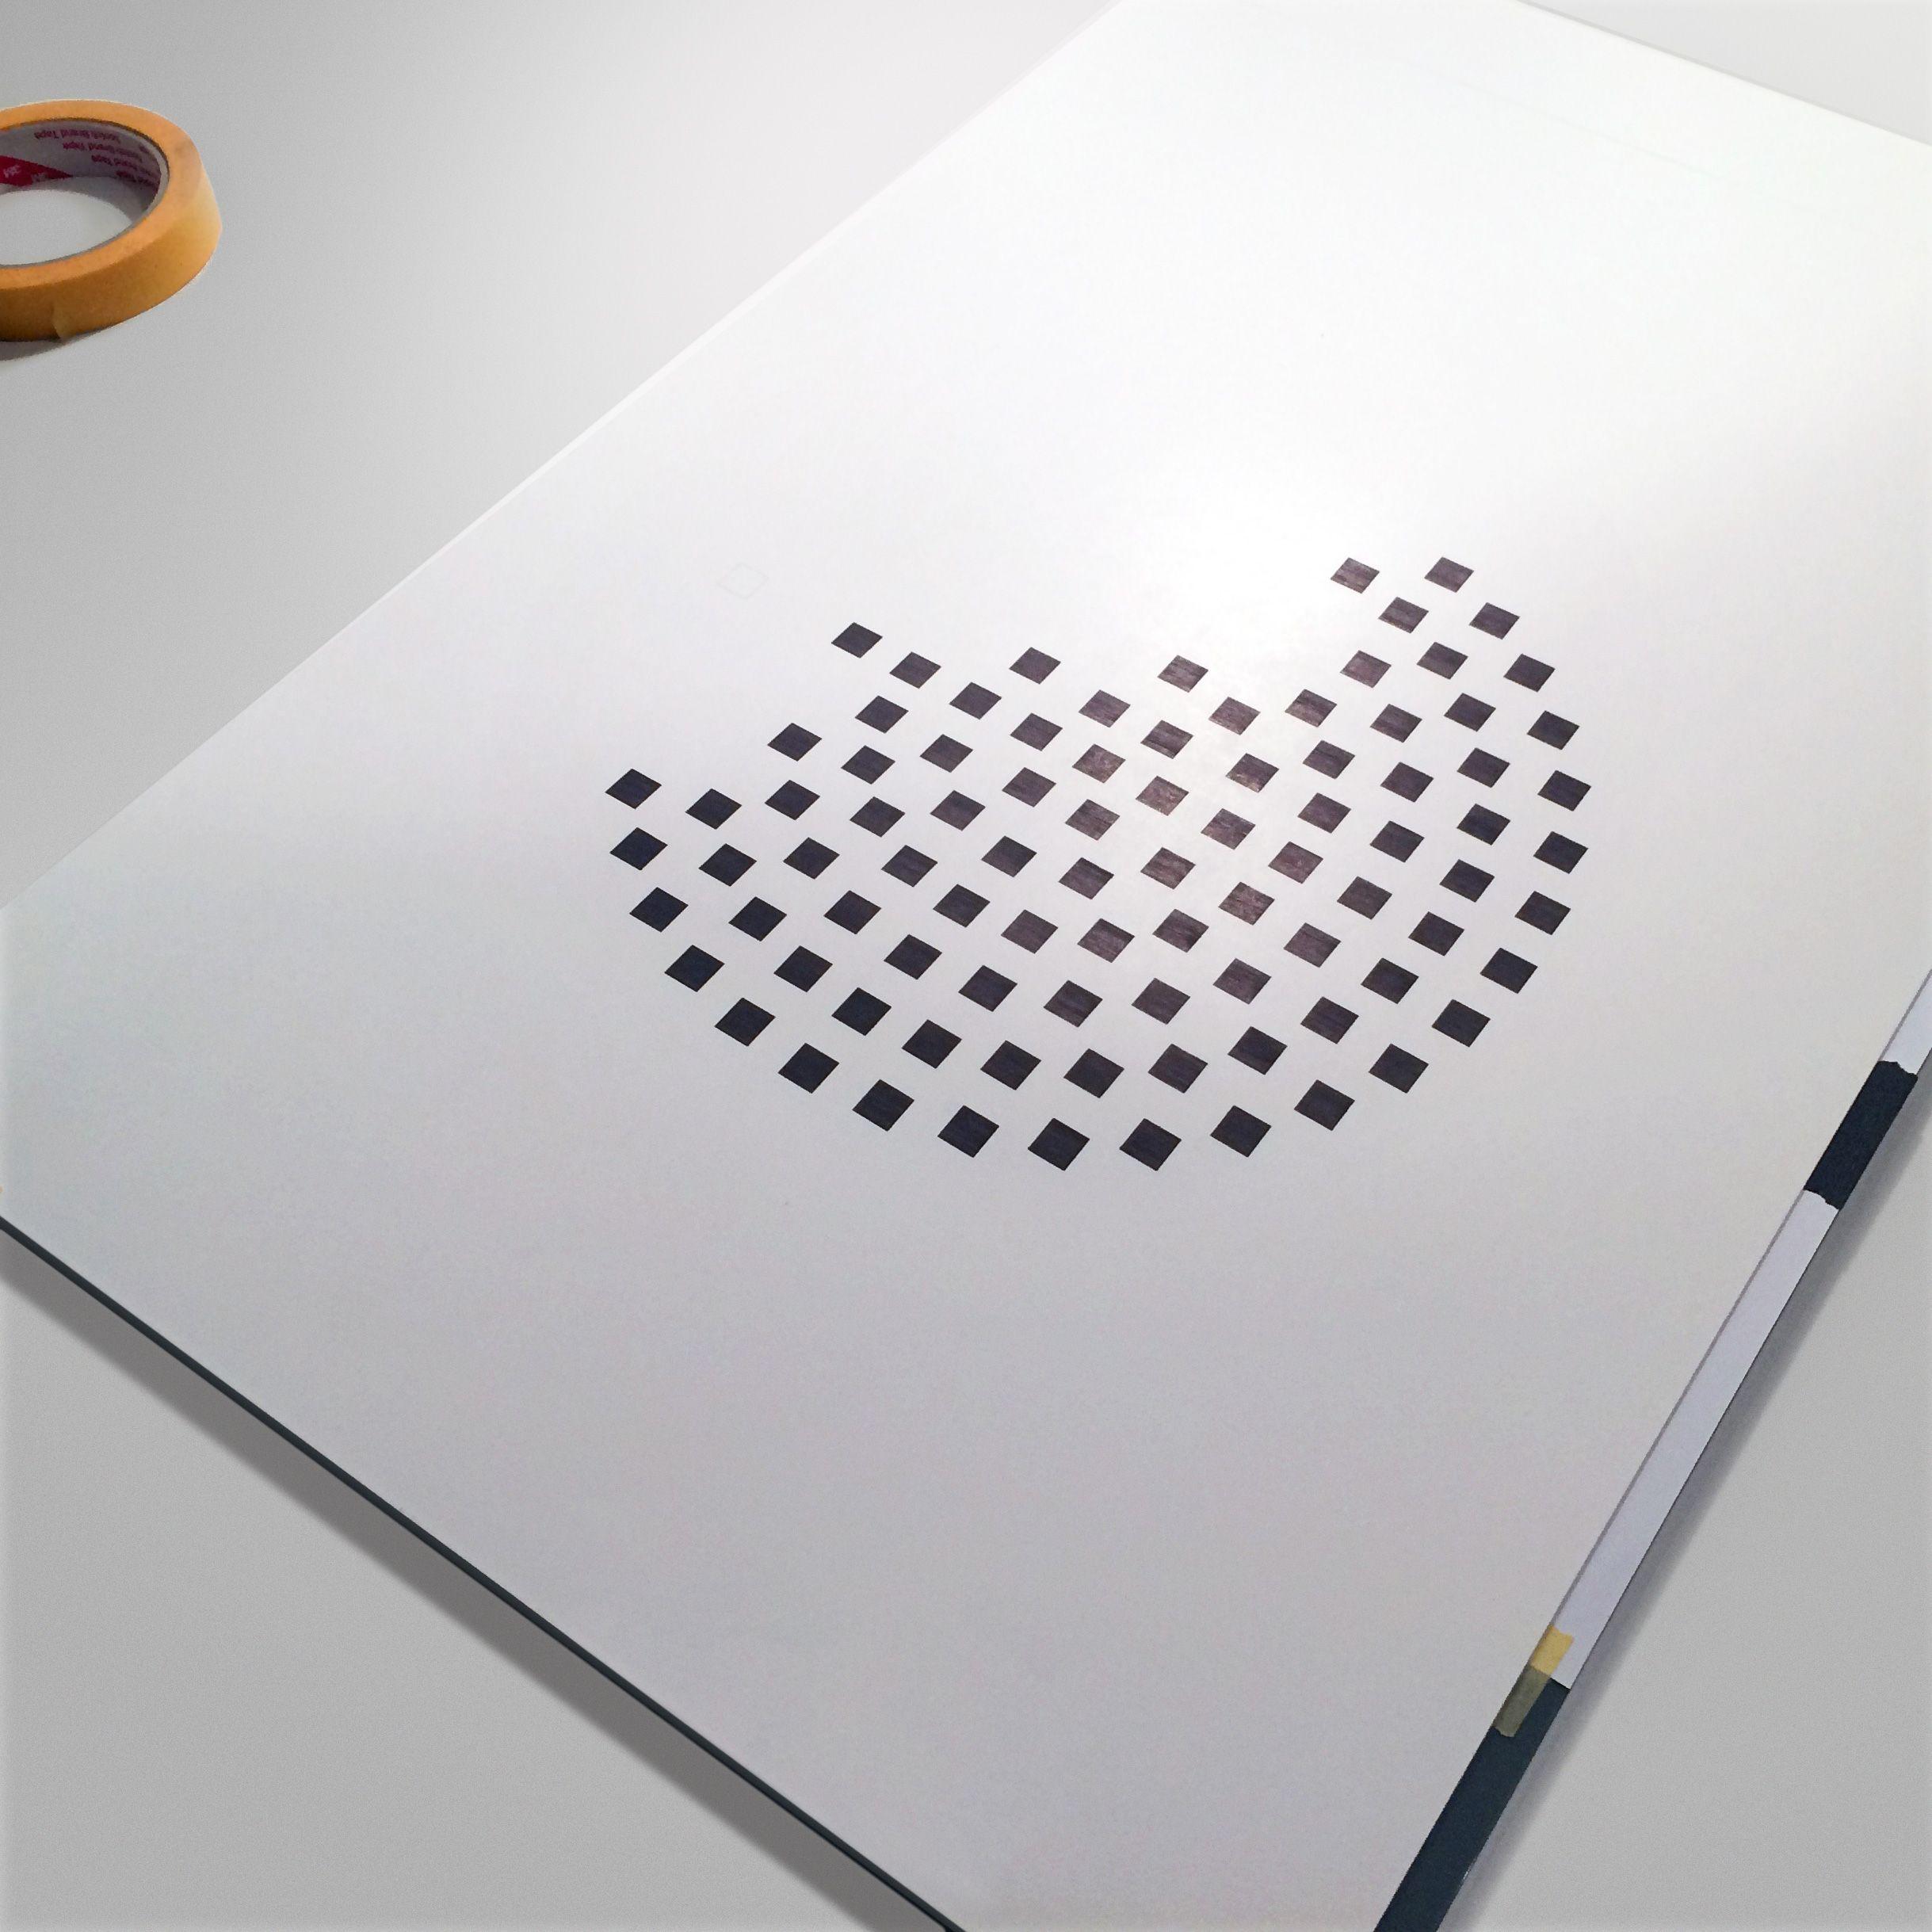 Runde Null · work in progress · ink on paper · monochrome · process · minimal art